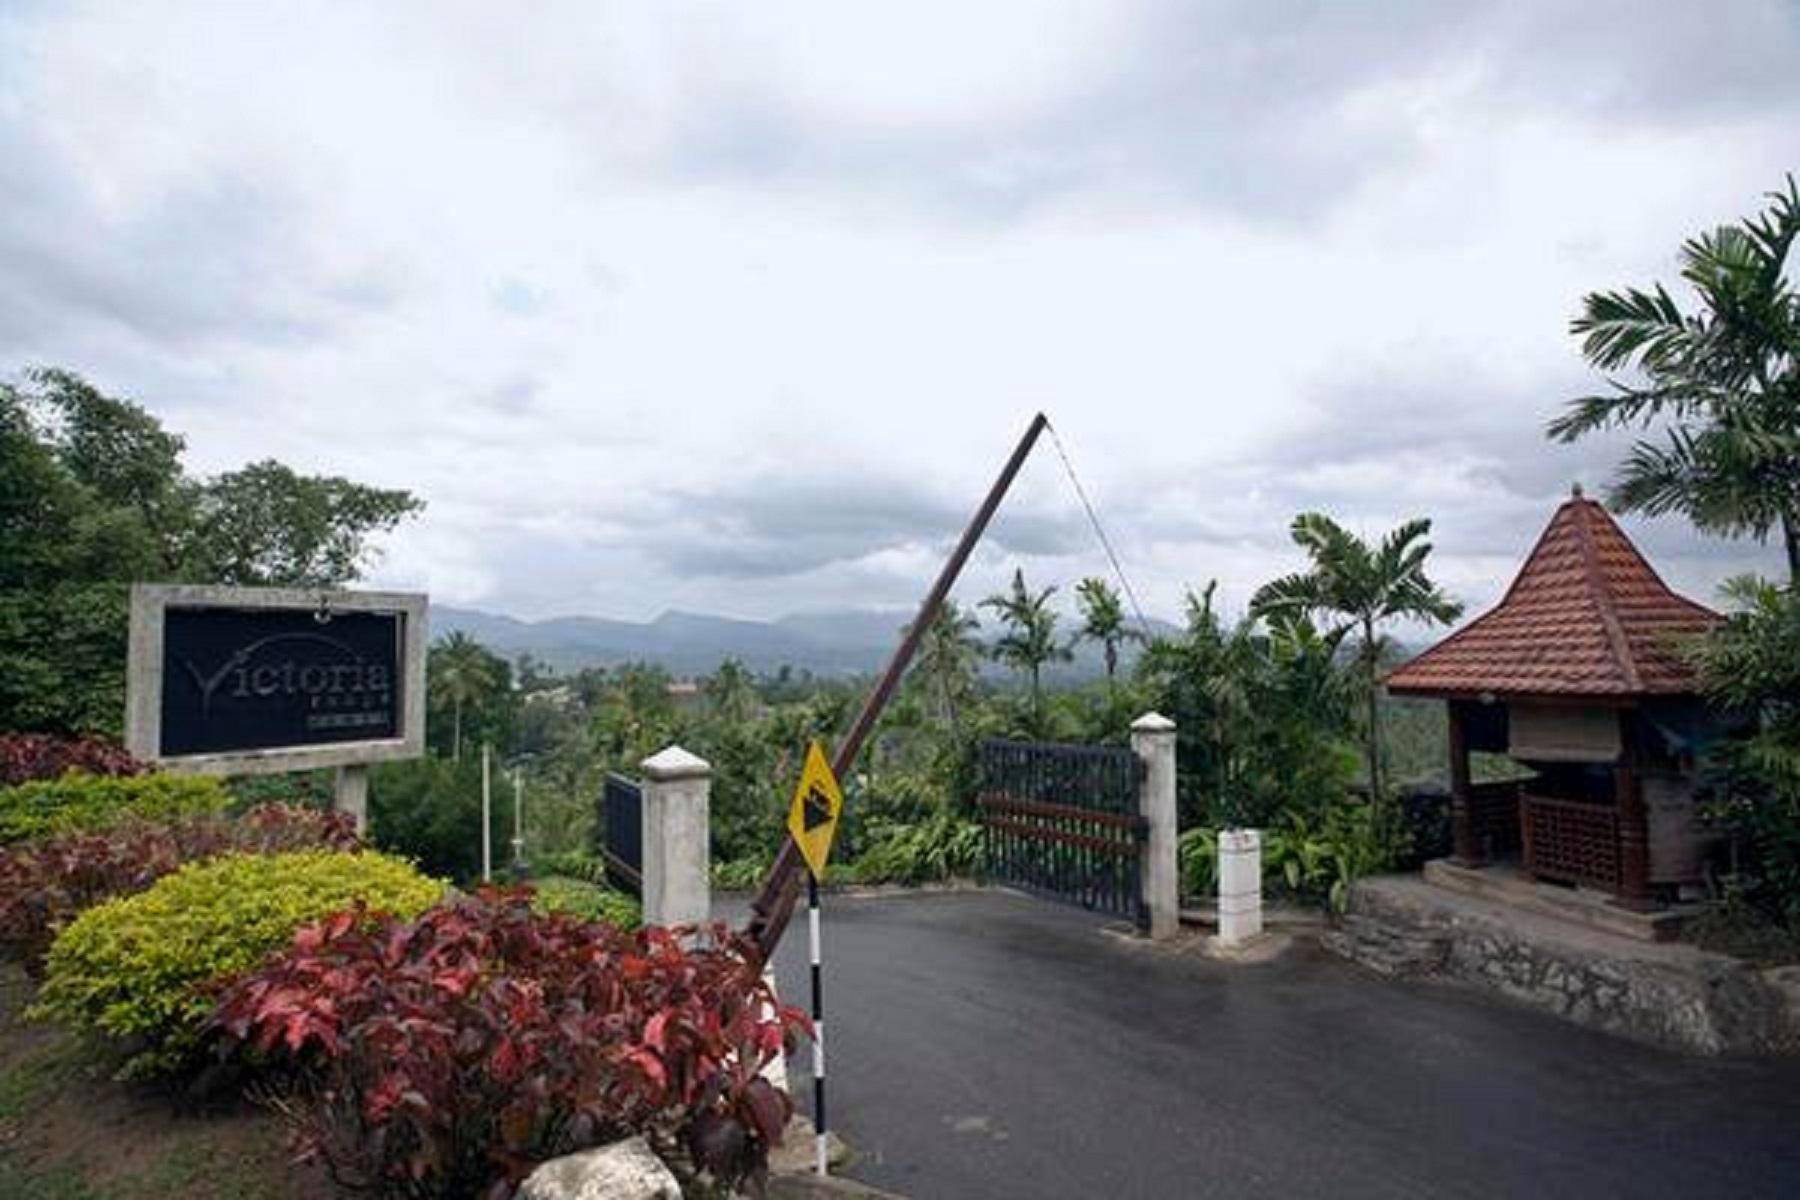 Victoria Range Villas